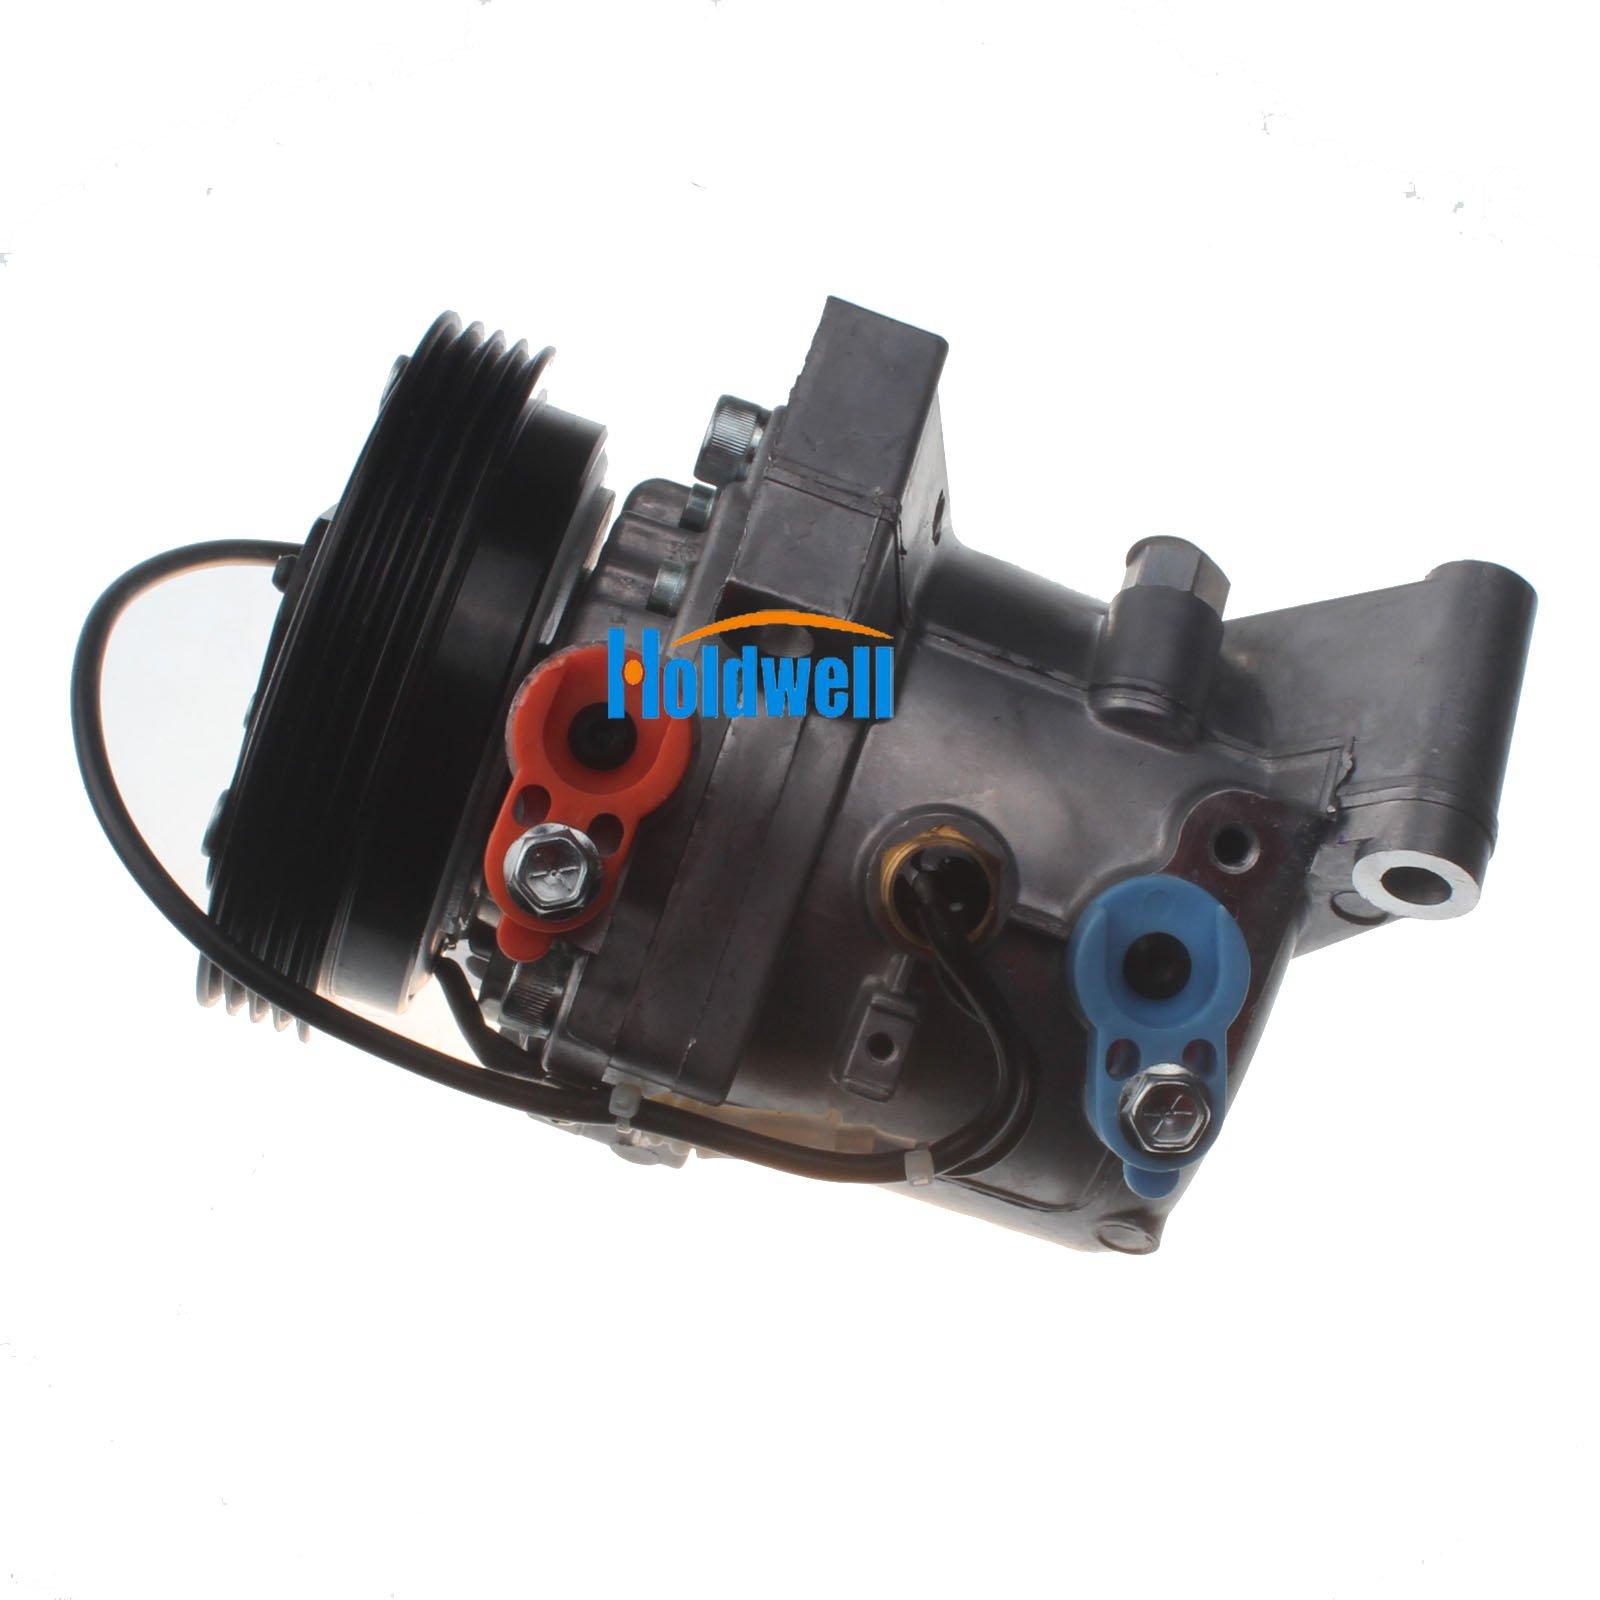 Holdwell Auto AC Compressor 95201-77GB2 9520177GB2 for Suzuki Jimny Seiko Seiki SS07LK10 by Holdwell (Image #3)